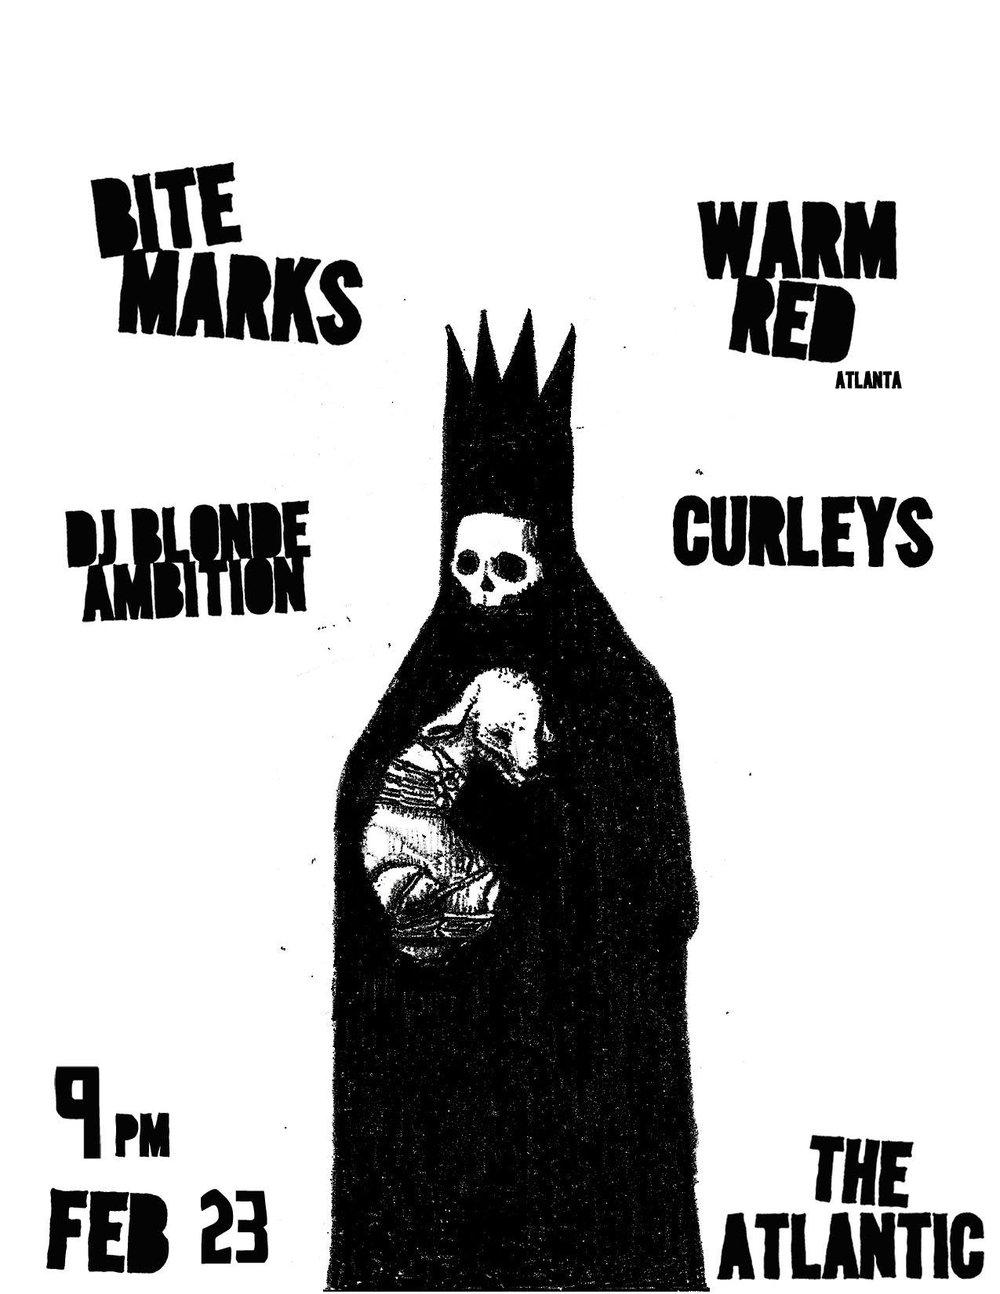 Saturday, Feb 23rd   BiteMarks  Warm Red (Atlanta) Curleys DJ Blonde AMbition  Doors at 9pm / Show starts at 10! $5 (21+ only)